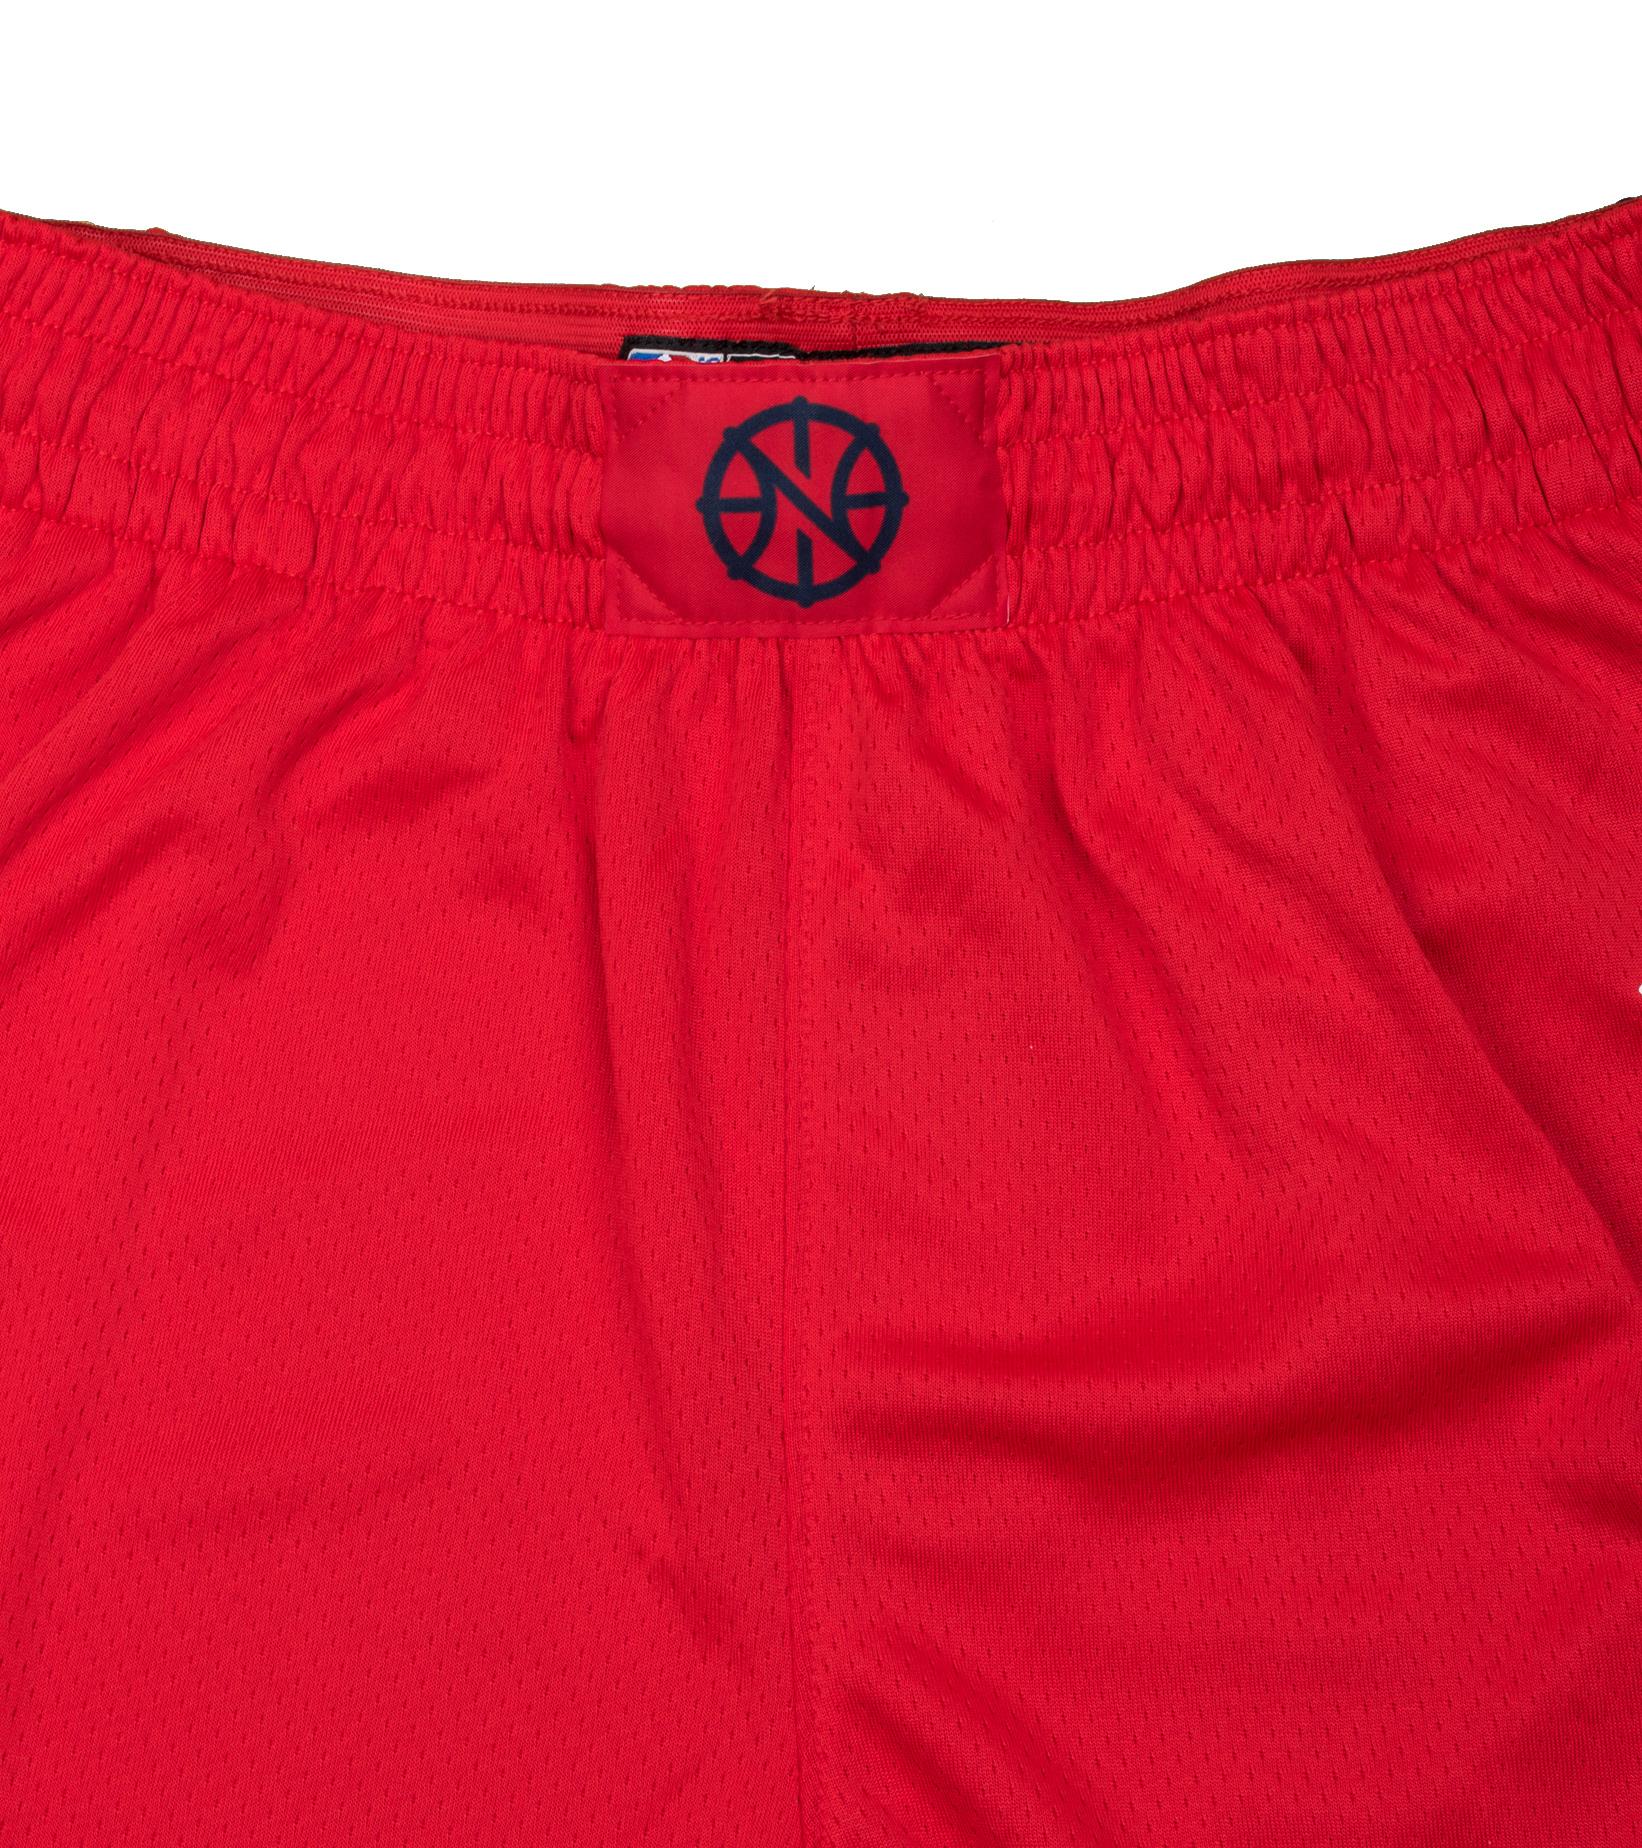 "New Orleans Pelicans Statement Edition '20 Swingman Short ""University Red/College Navy""-4"